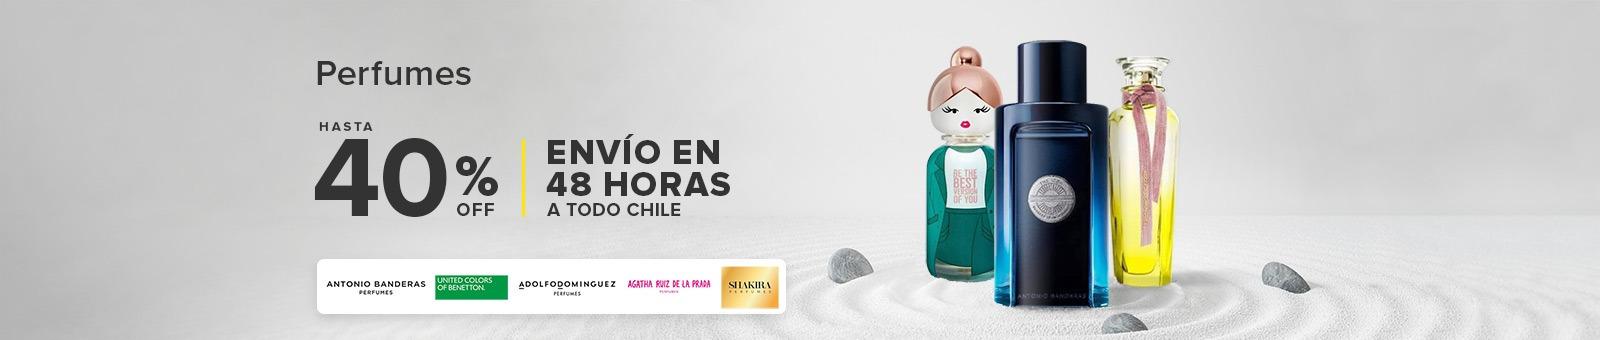 Perfumes en Mercado Libre